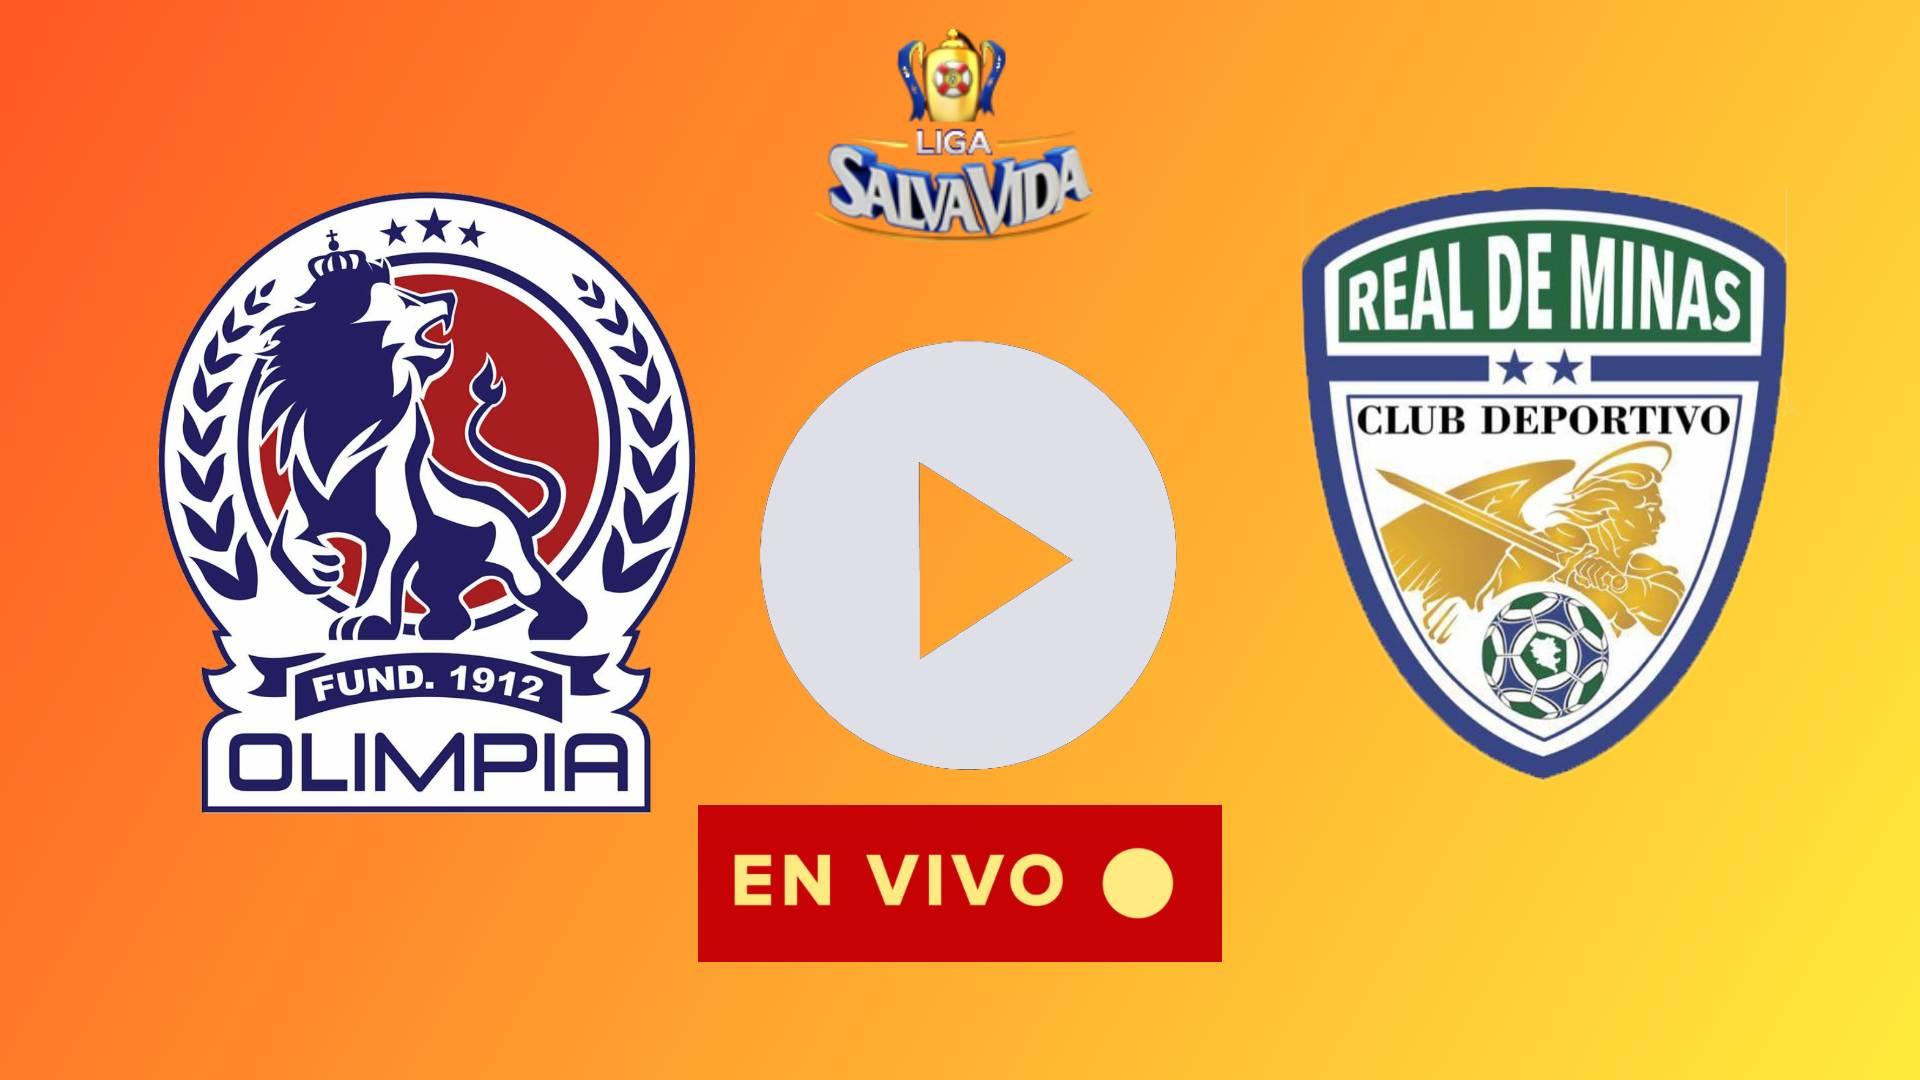 HOY EN VIVO Olimpia vs Real de Minas por el torneo apertura 2020-2021 de la Liga Salvavida